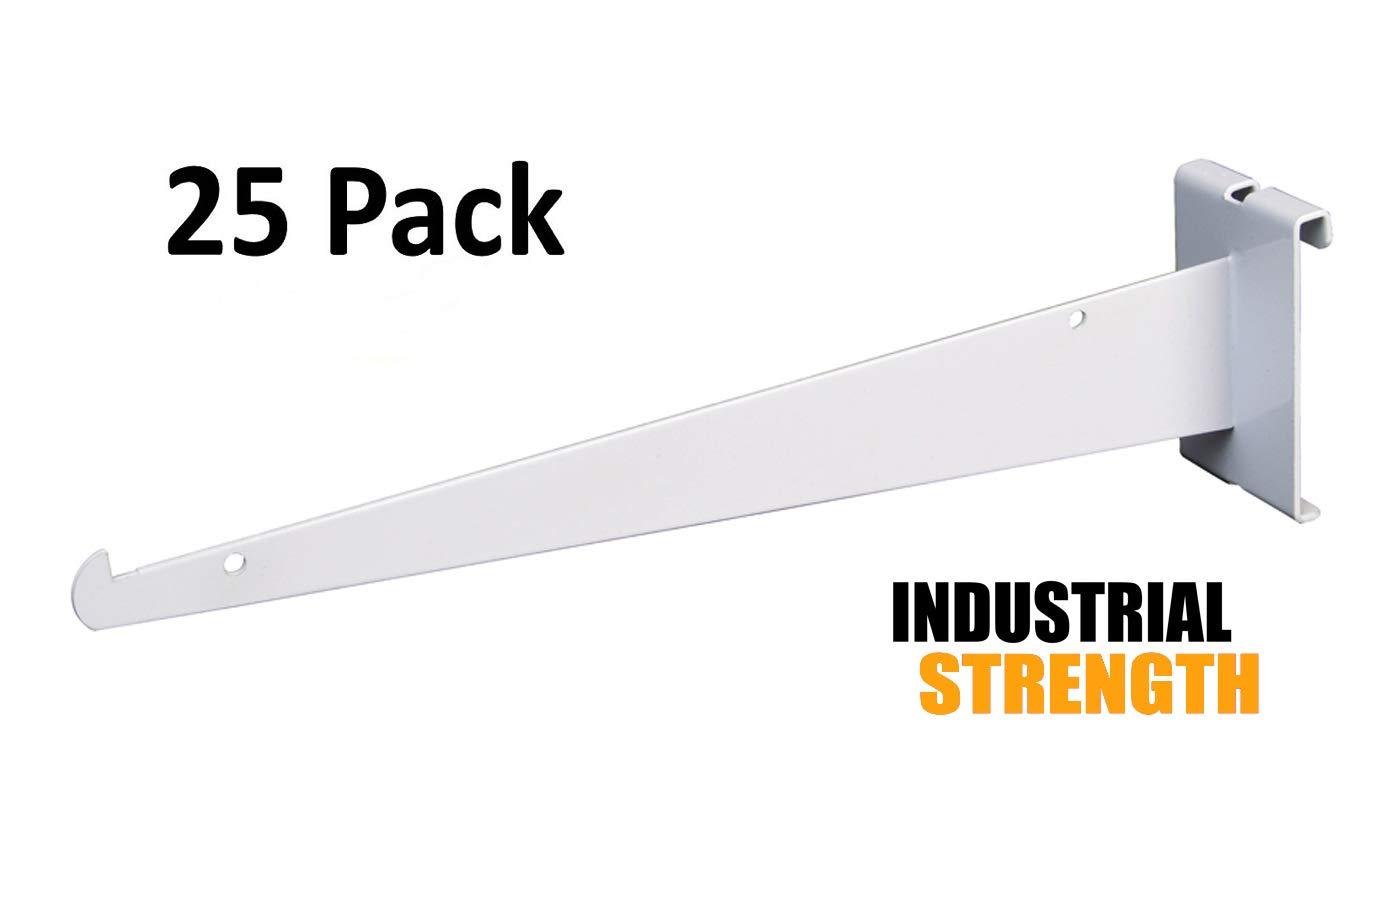 Only Hangers Shelf Brackets for Gridwall, 12'' White Grid Panel Brackets (Pack of 25) - Shelf Brackets Fit all 3'' x 3'' Standard Gridwall Panels